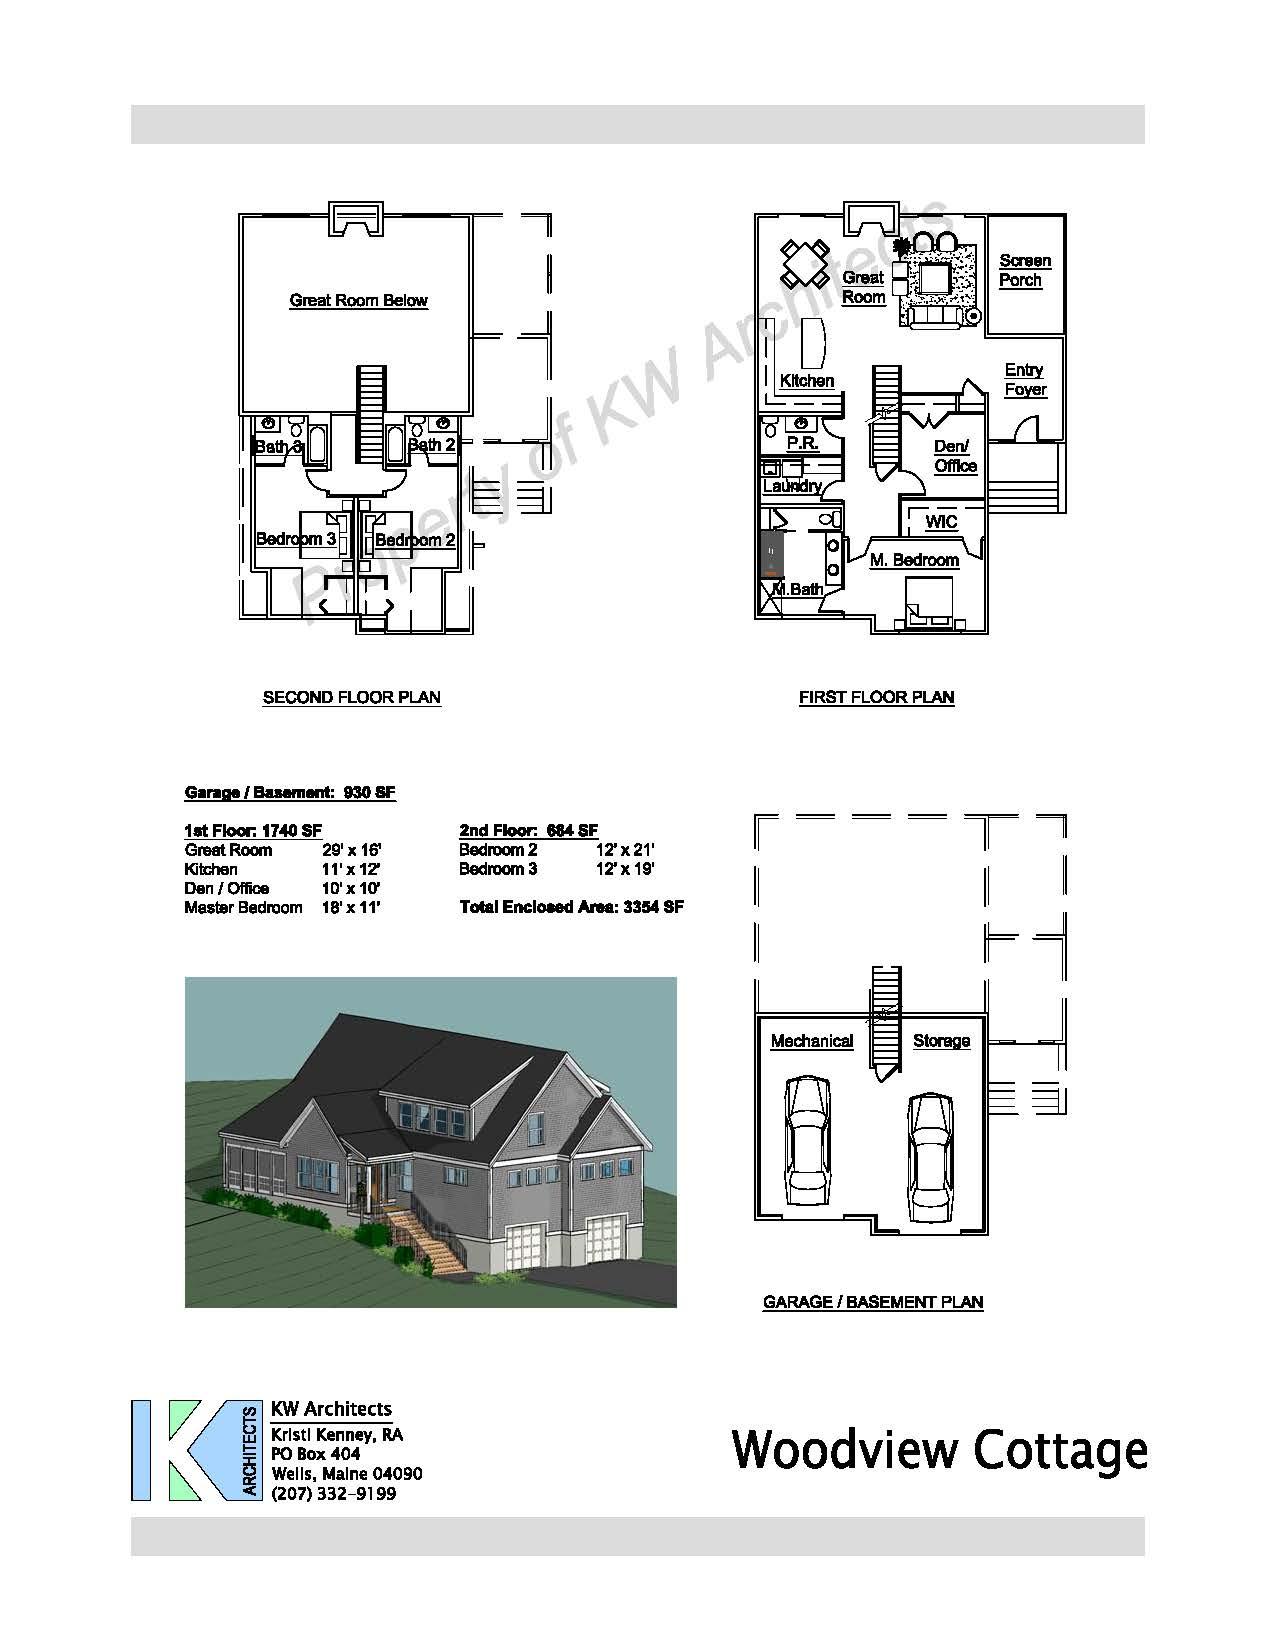 Woodview Cottage Marketing Sheet.jpg